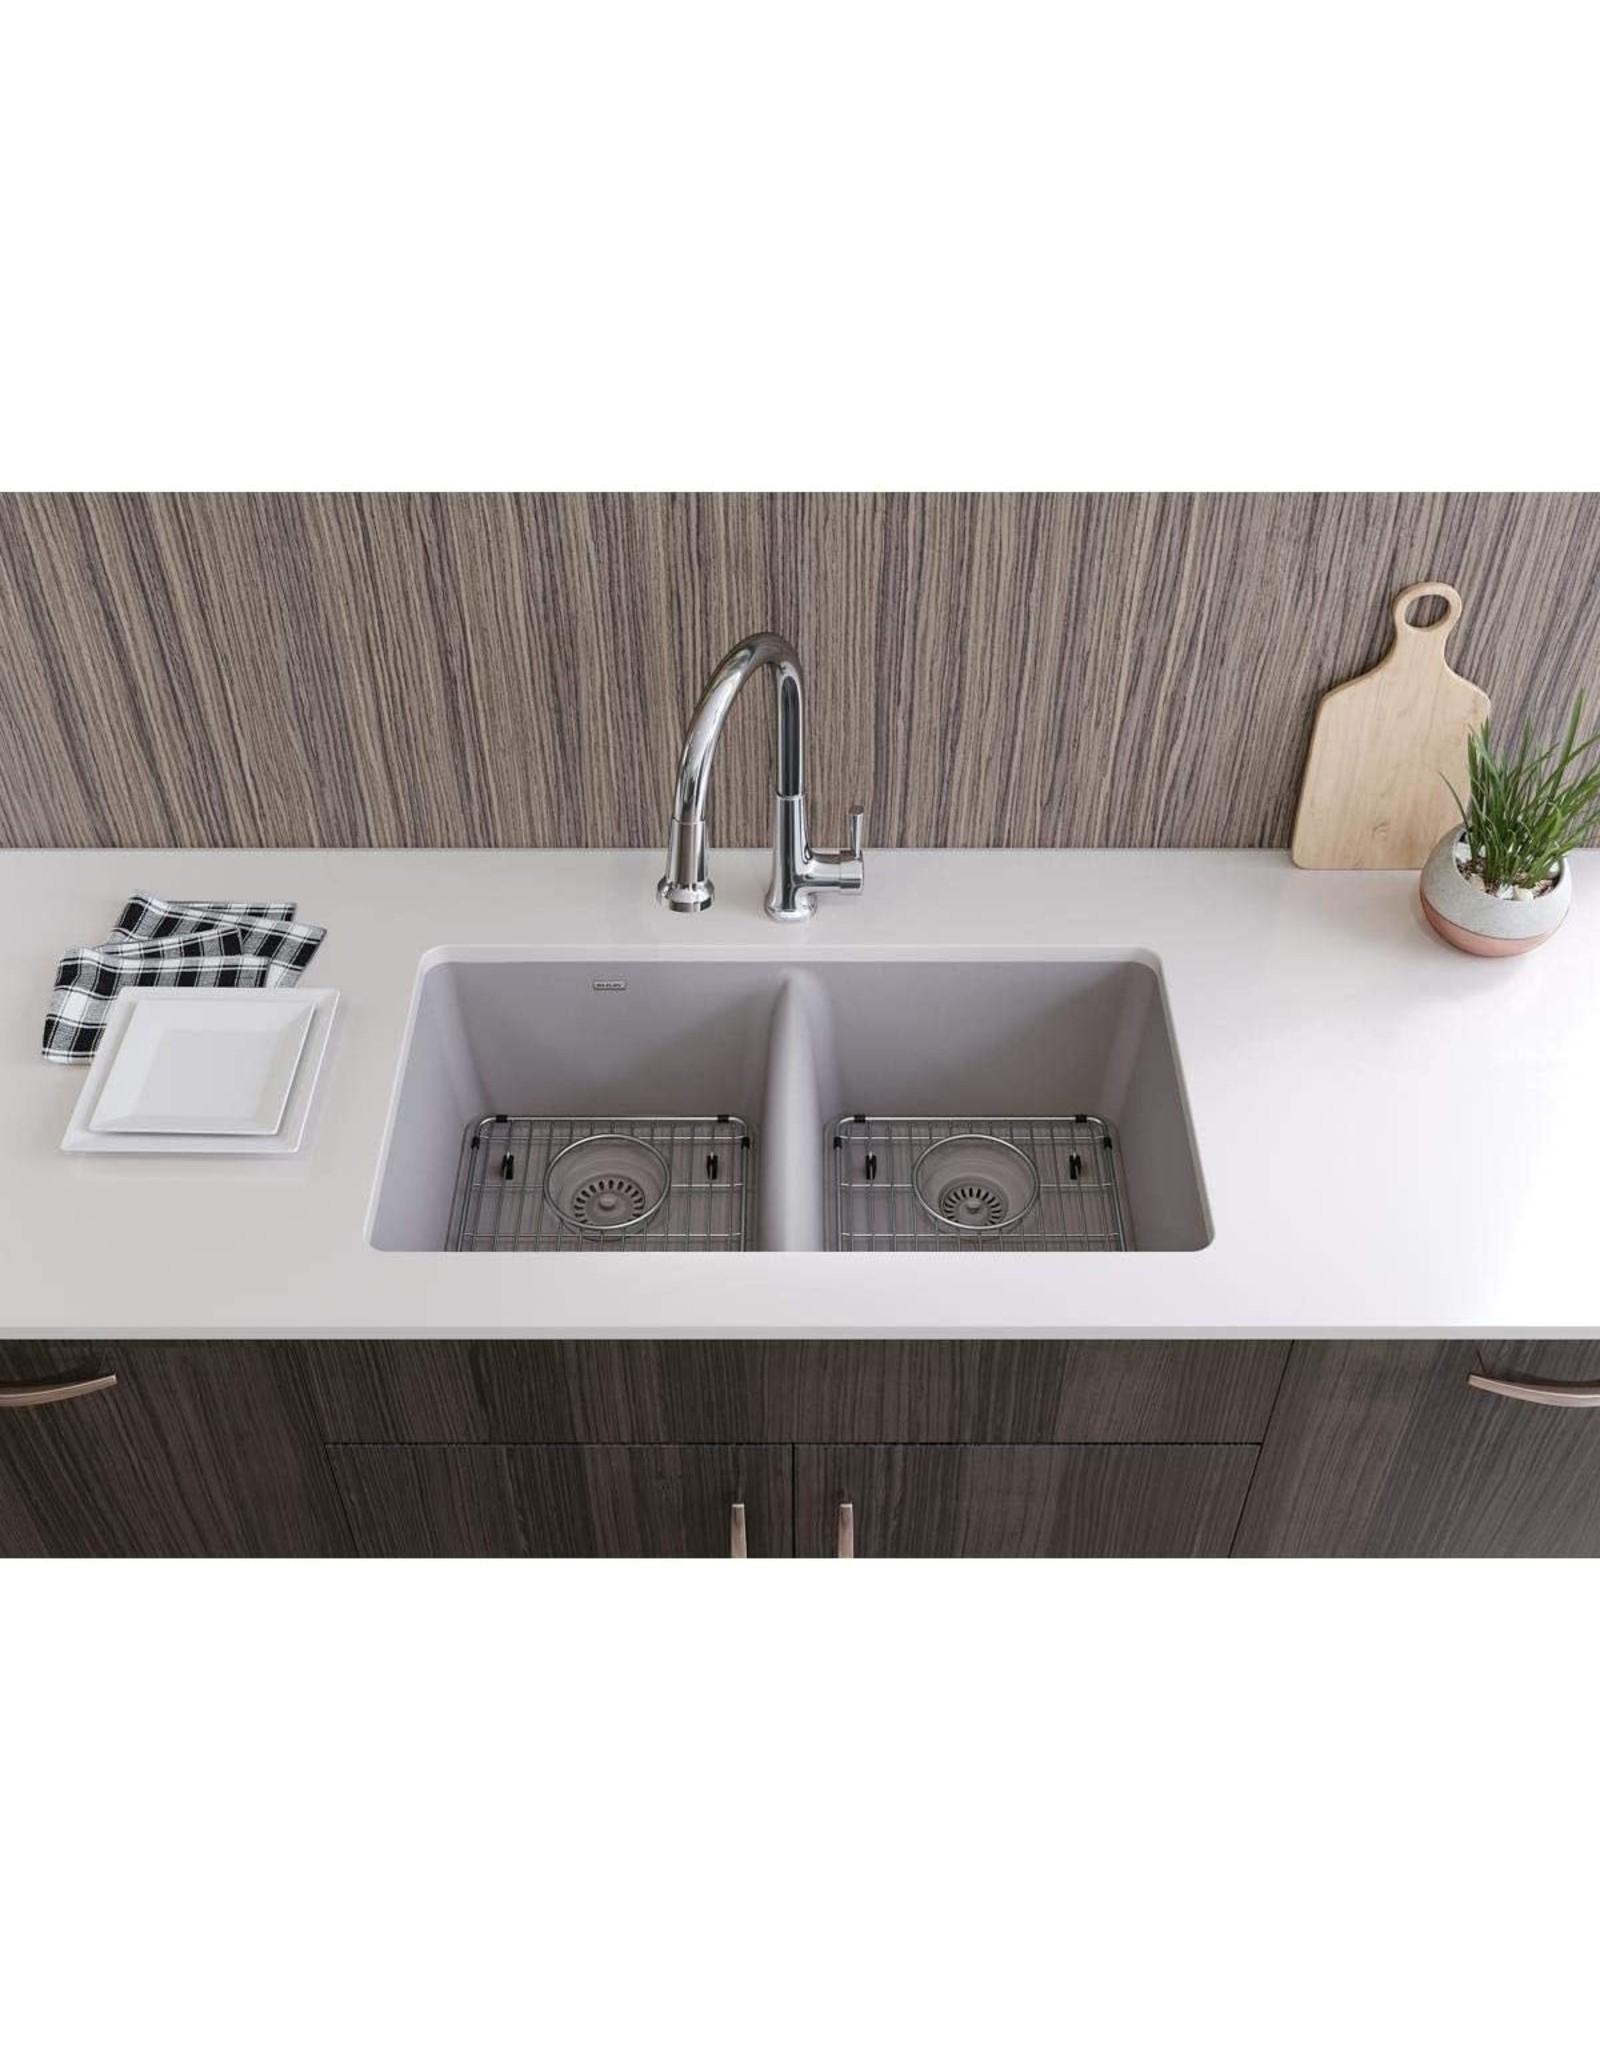 "Elkay Elkay Quartz Classic ELGU3322GS0FC 33"" x 18-1/2"" x 9-1/2"", Equal Double Bowl Undermount Sink Kit with Faucet, Greystone"